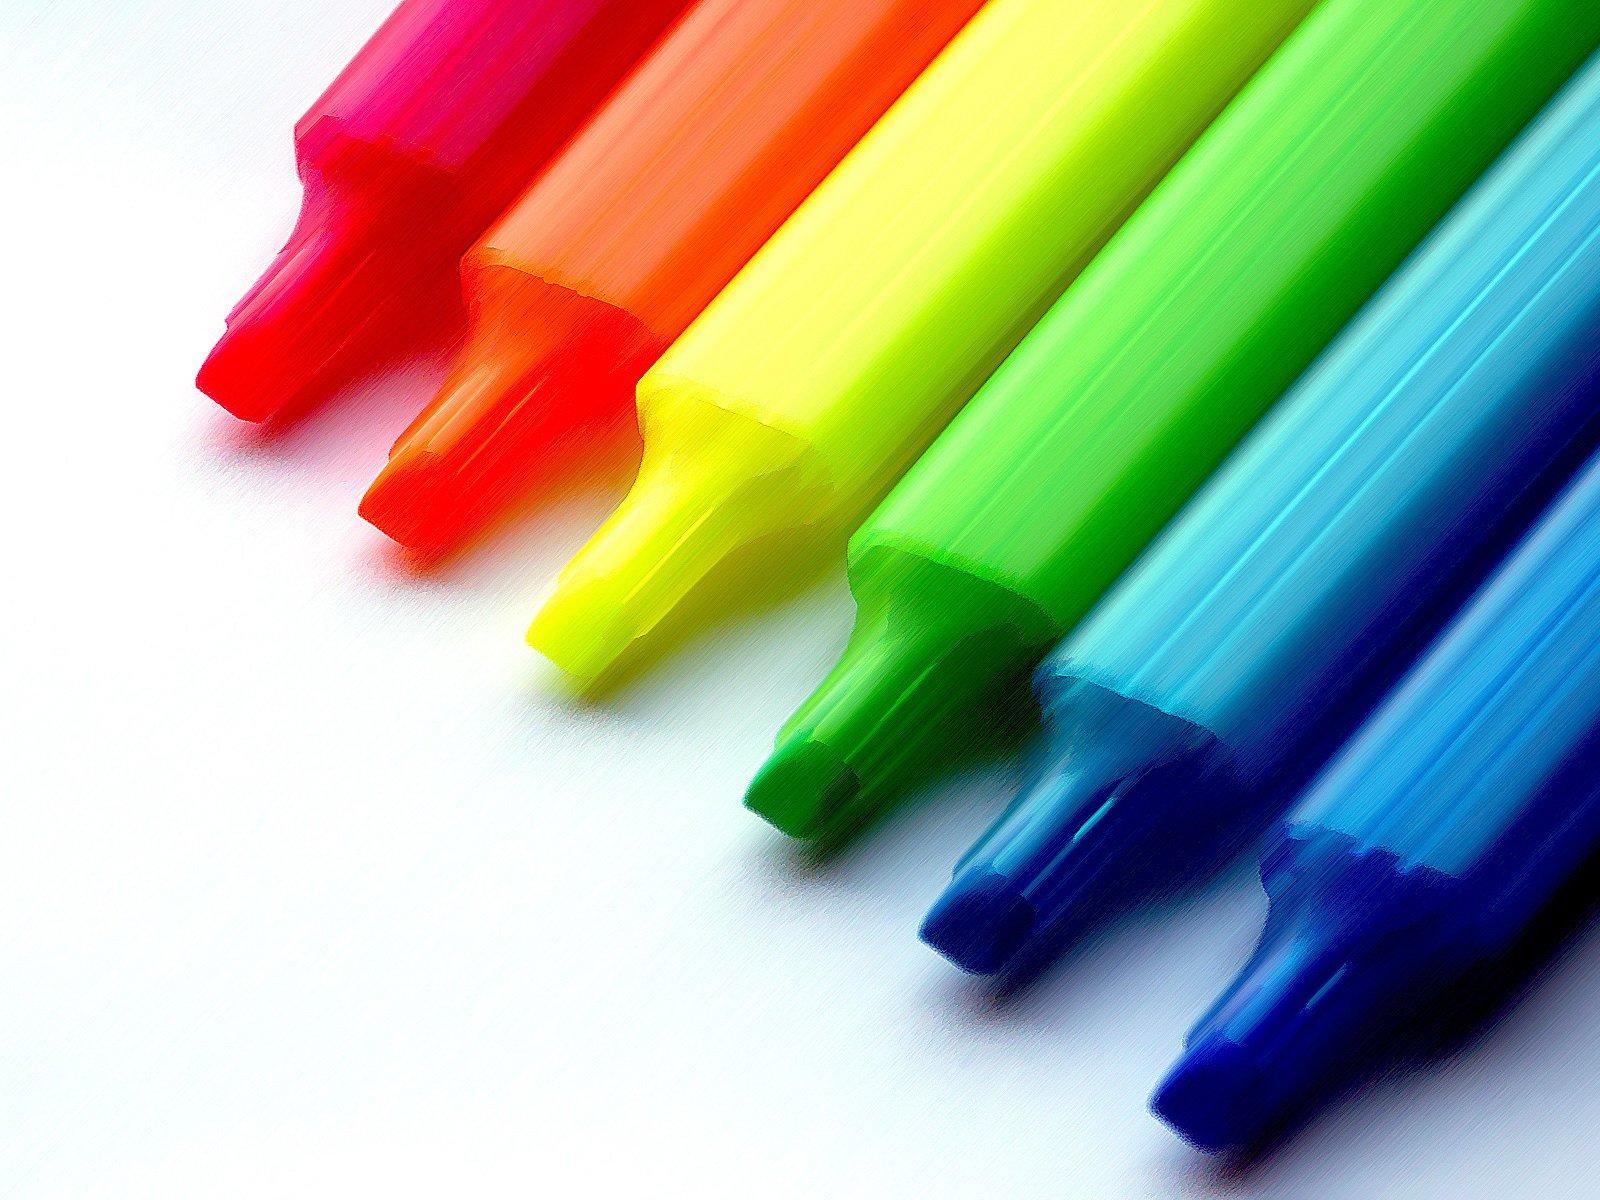 Desktop wallpaper pastelli colorati for Sfondi per desktop colorati